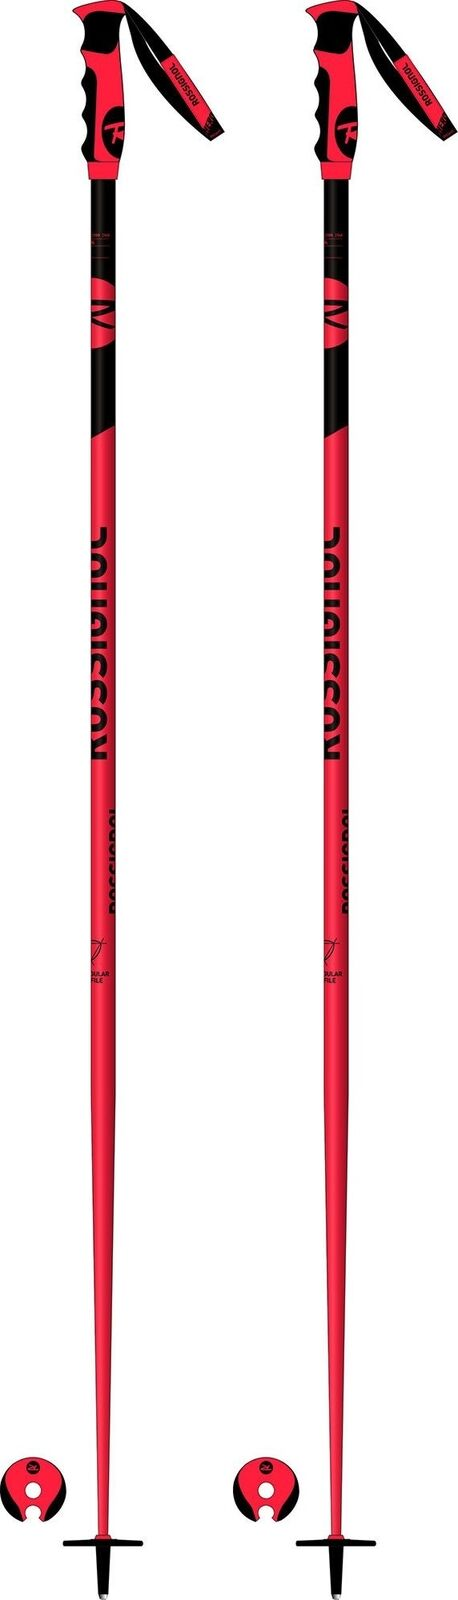 Rossignol Hero SL (rdh1020) - Ski Poles